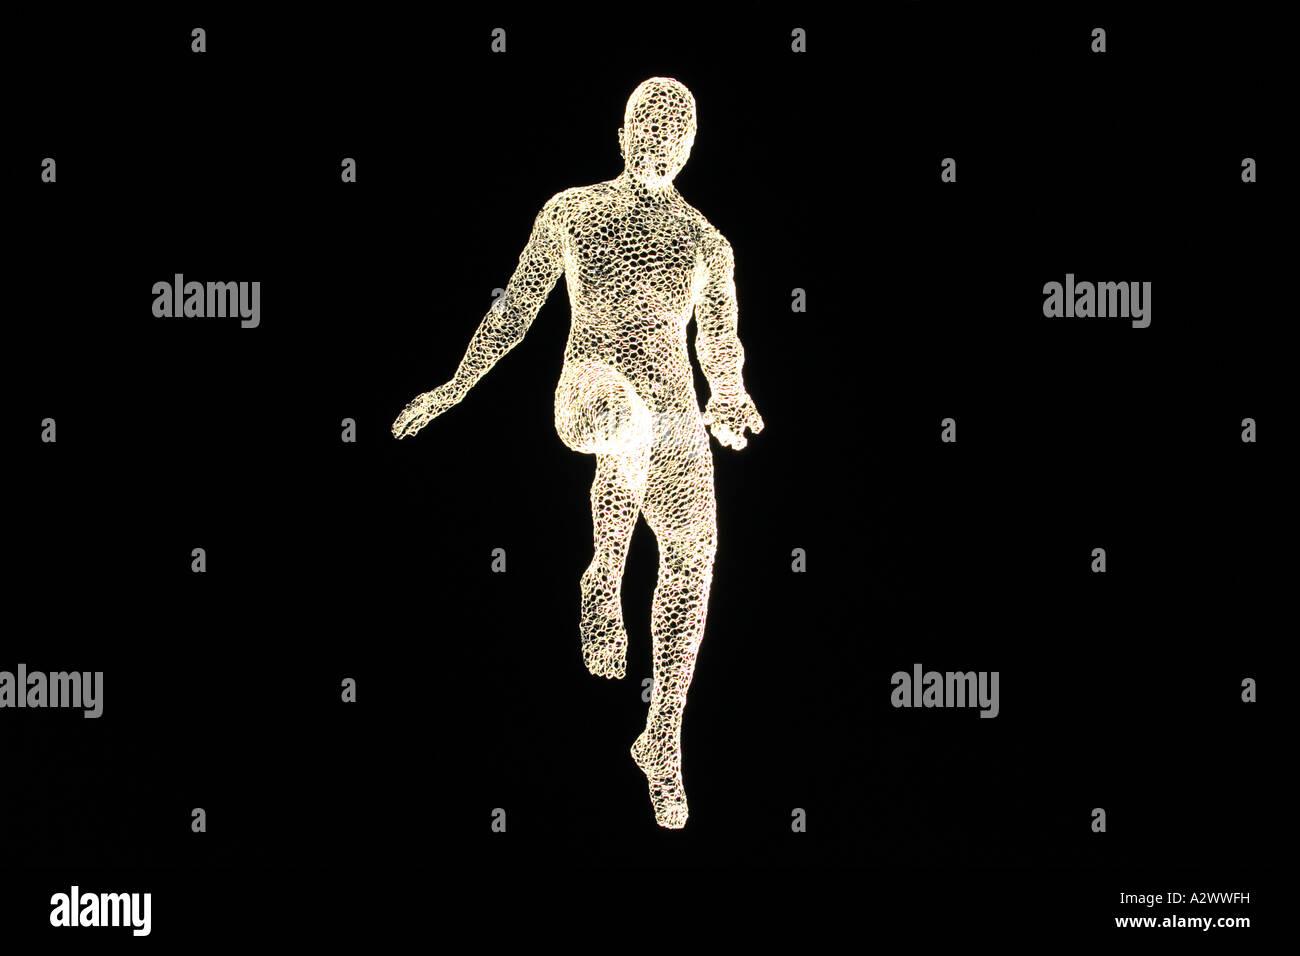 Human-shaped sculpture levitating, Geneva, Switzerland - Stock Image